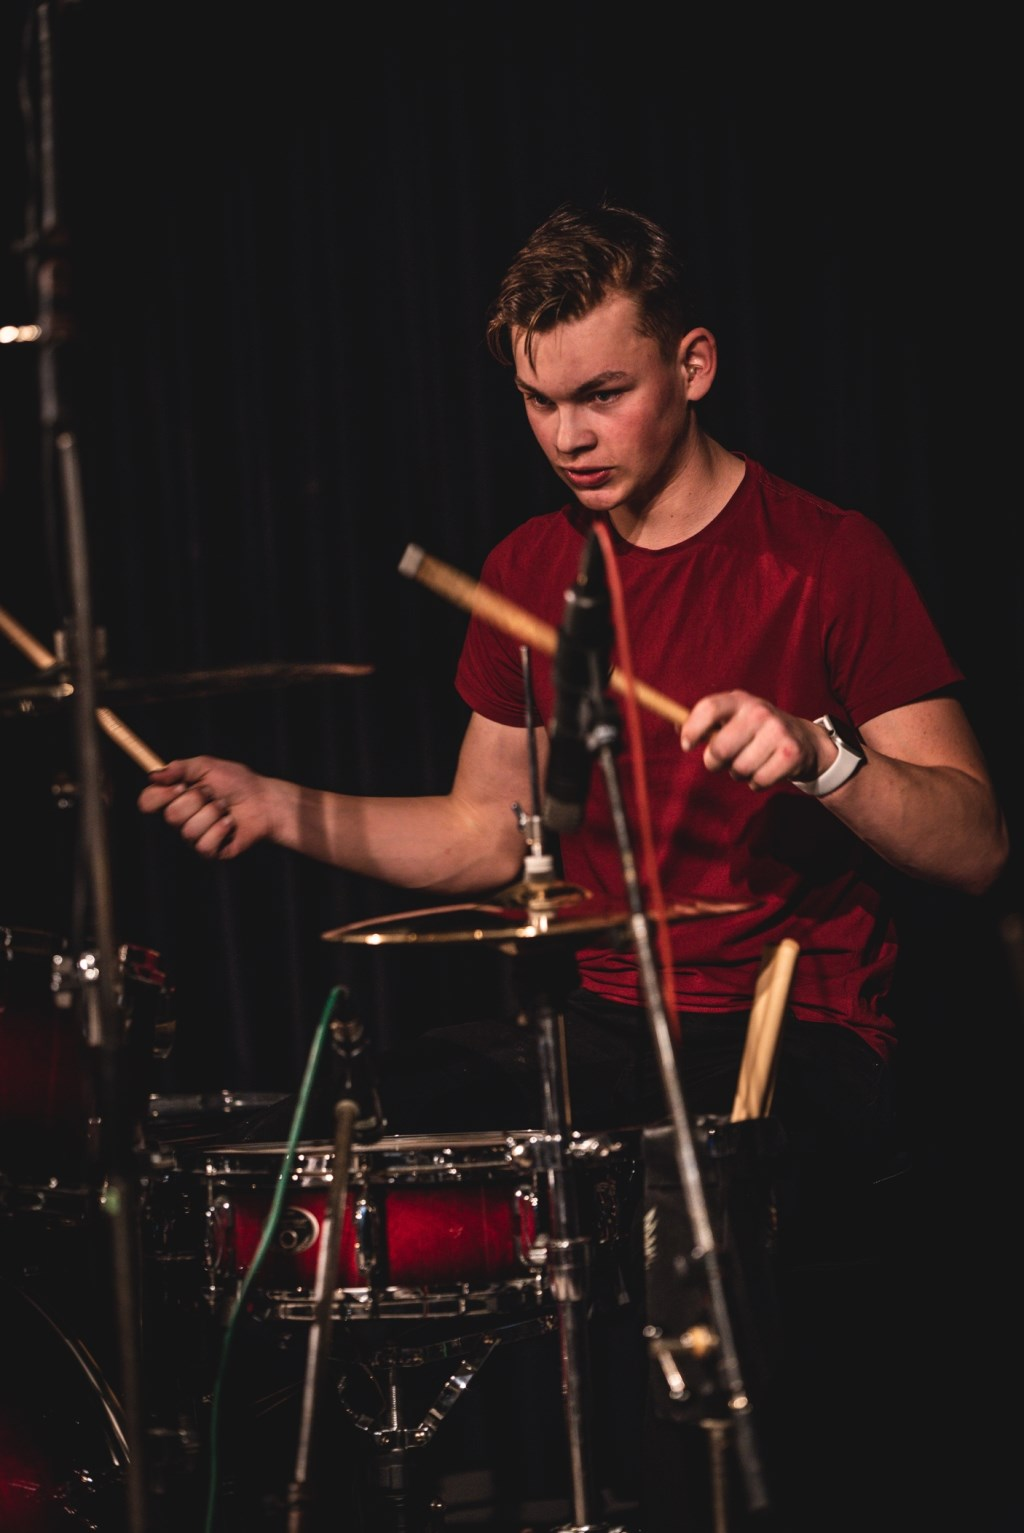 Mats Kuiperij achter de drums. Foto: Rick Mellink Foto: Rick Mellink © Achterhoek Nieuws b.v.